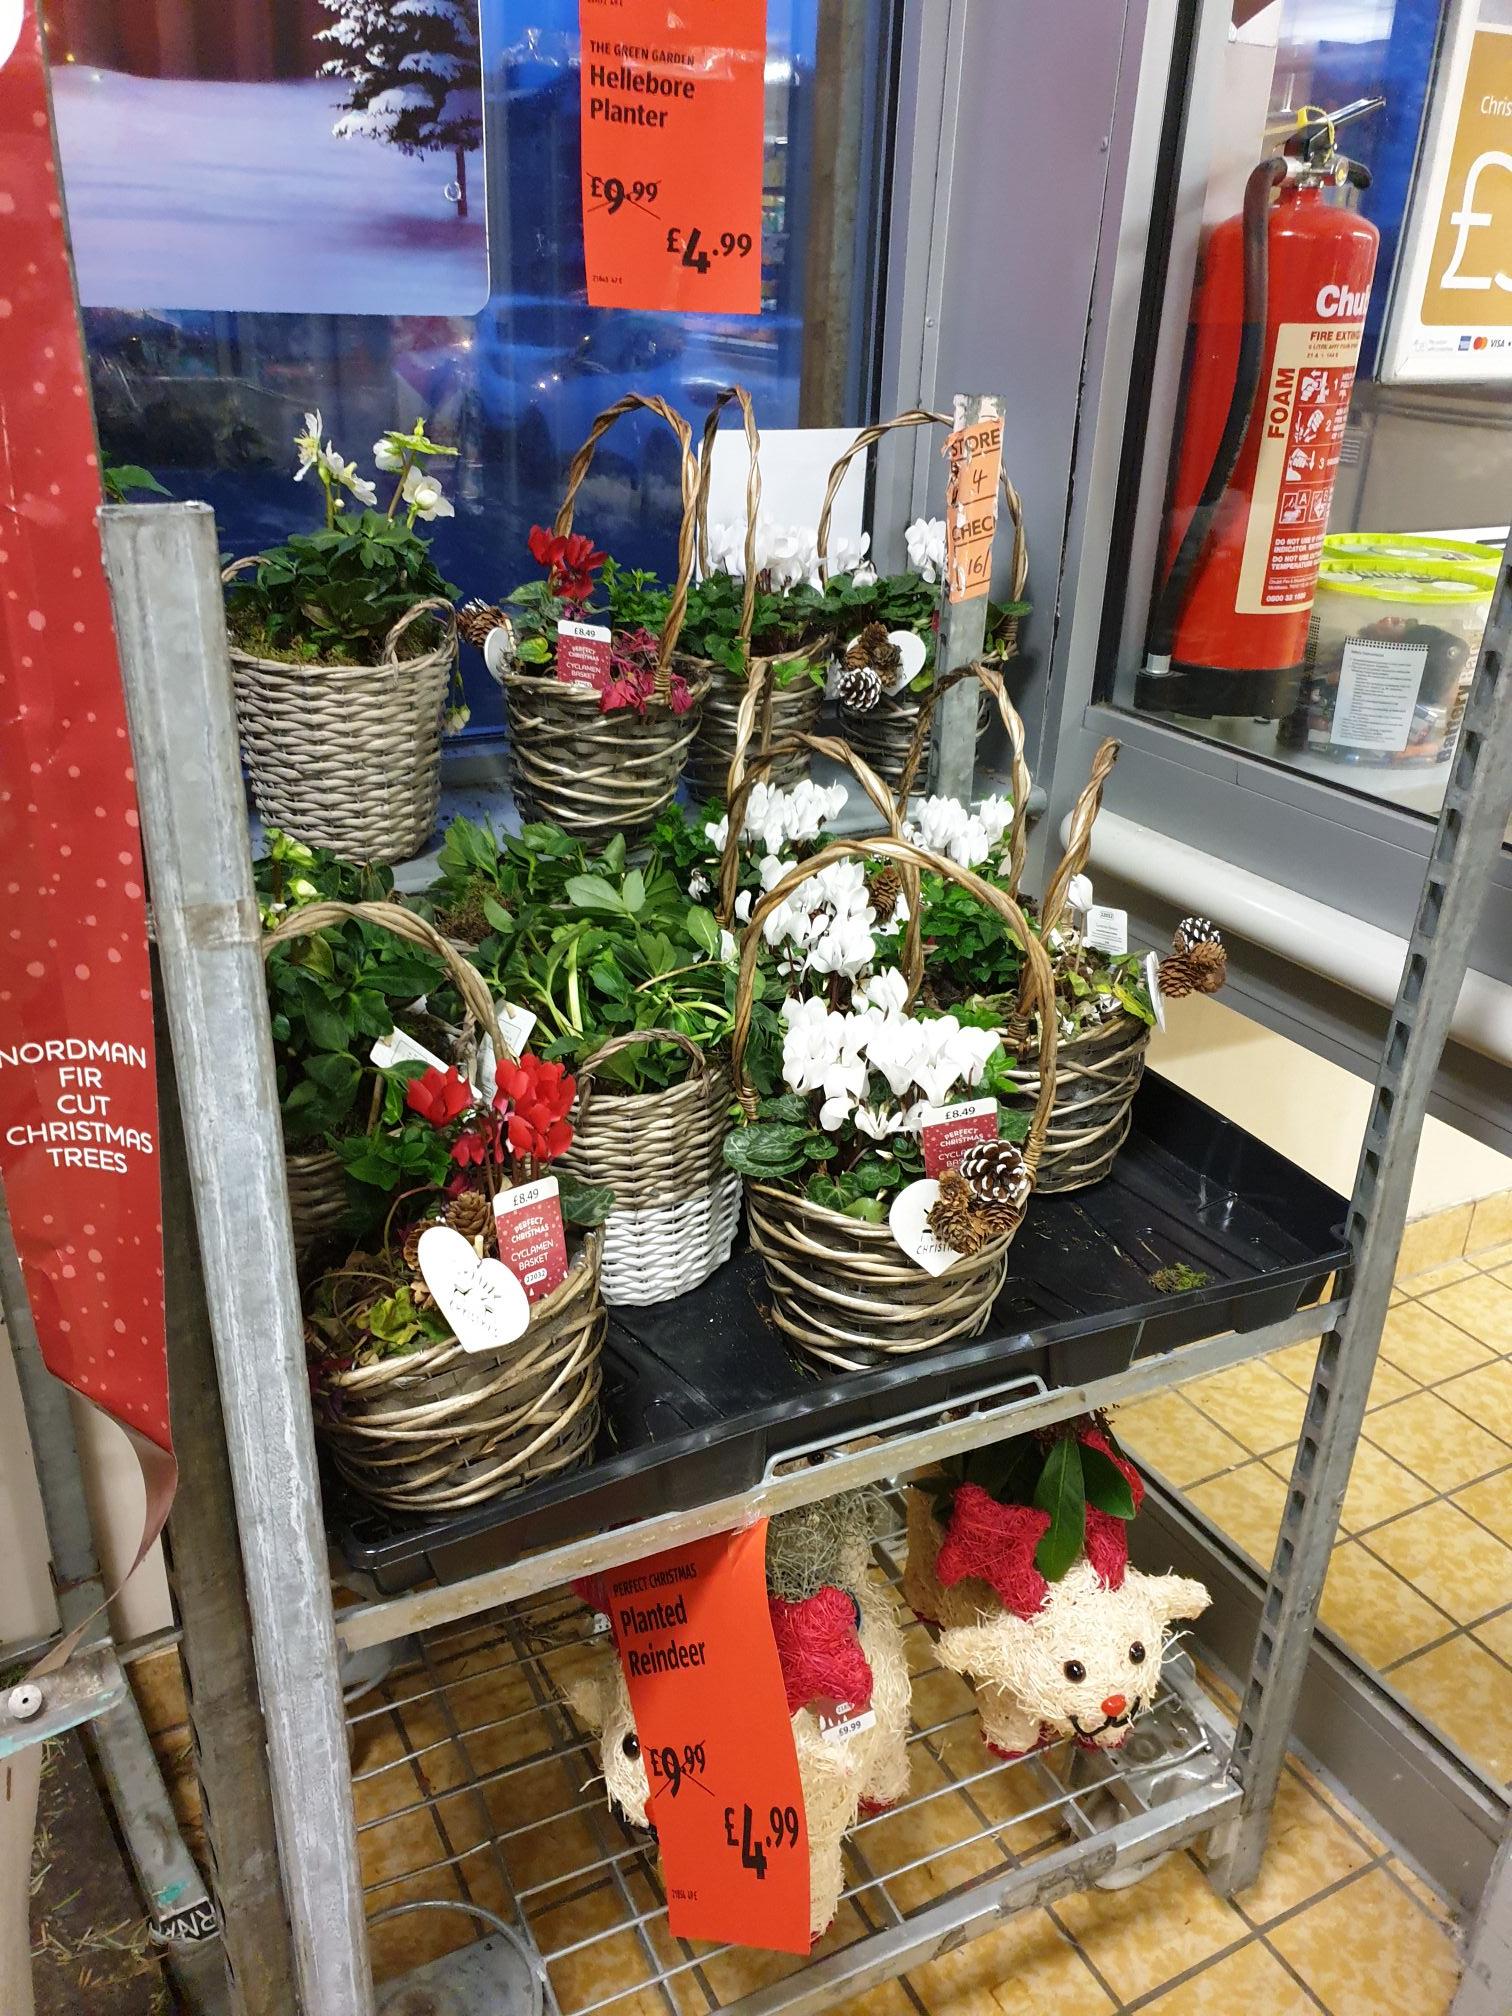 Aldi christmas planters reduced to £4.99